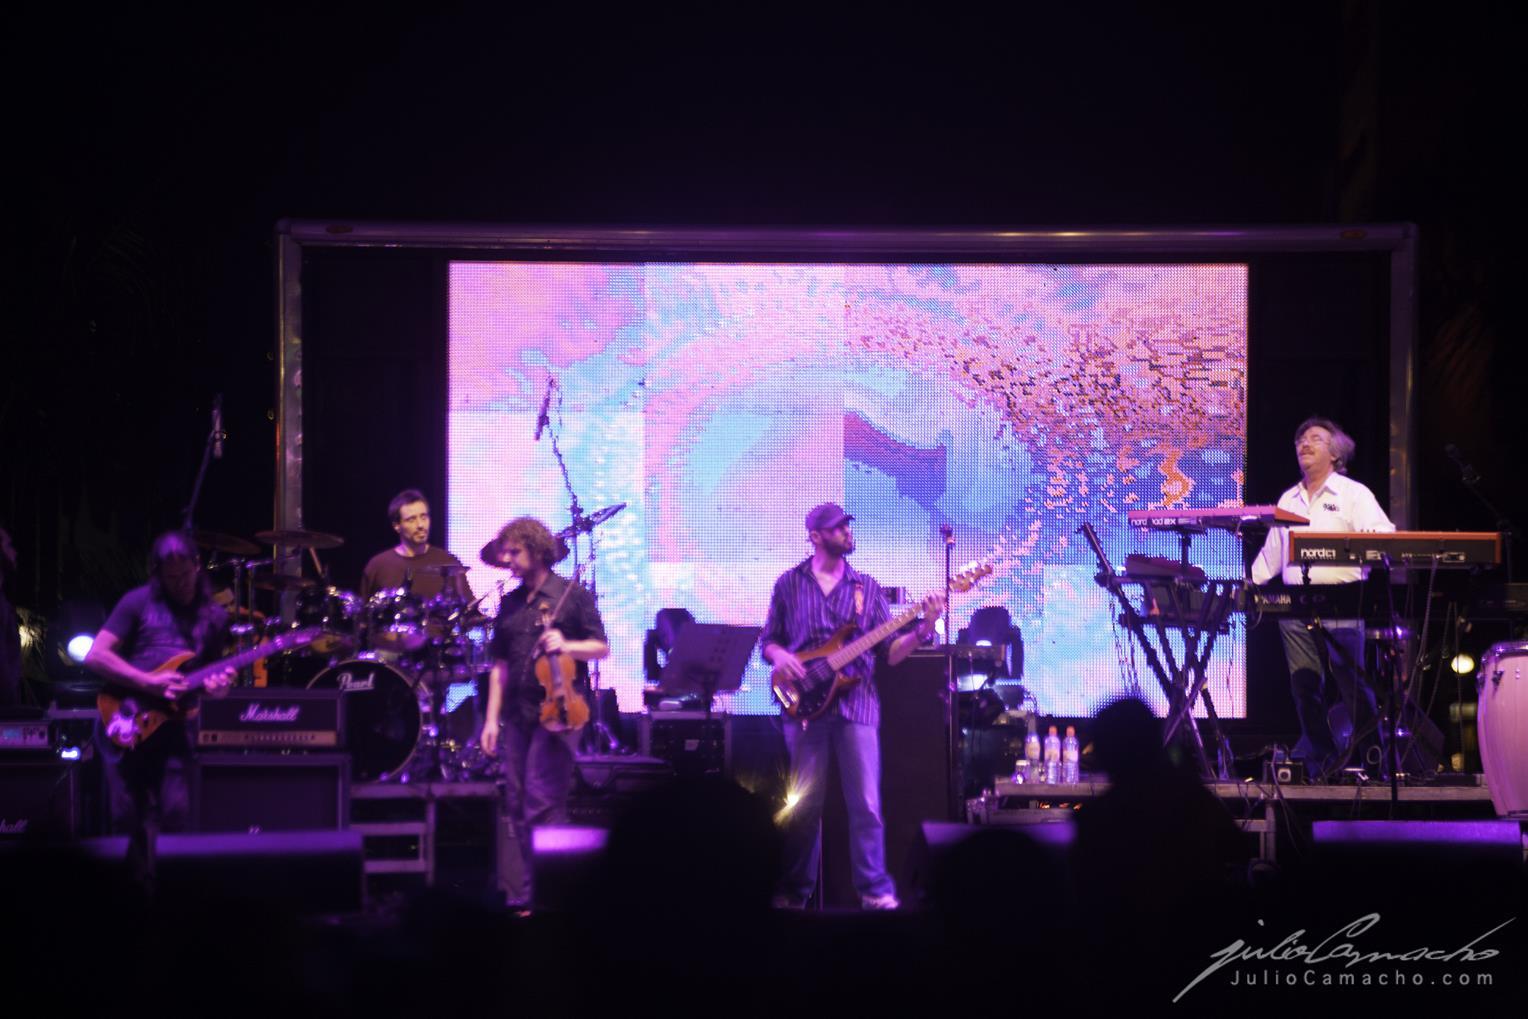 2014-10-30 31 CAST TOUR Ensenada y Tijuana - 1424 - www.Juli (Copy).jpg